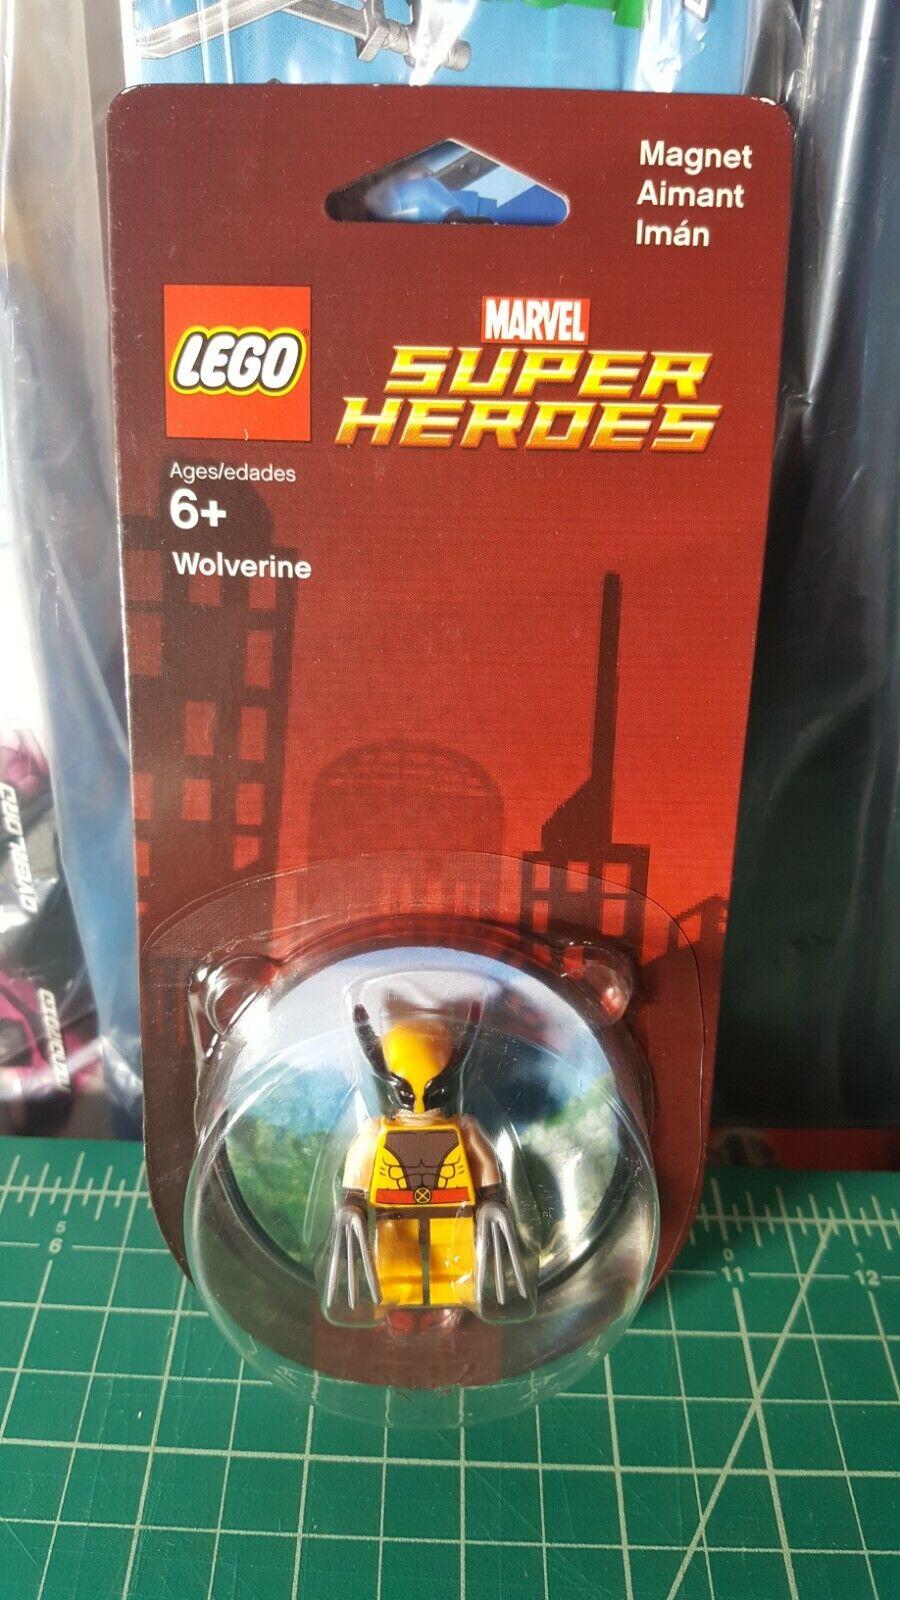 Wolverine X-Men LEGO Magnet 851007